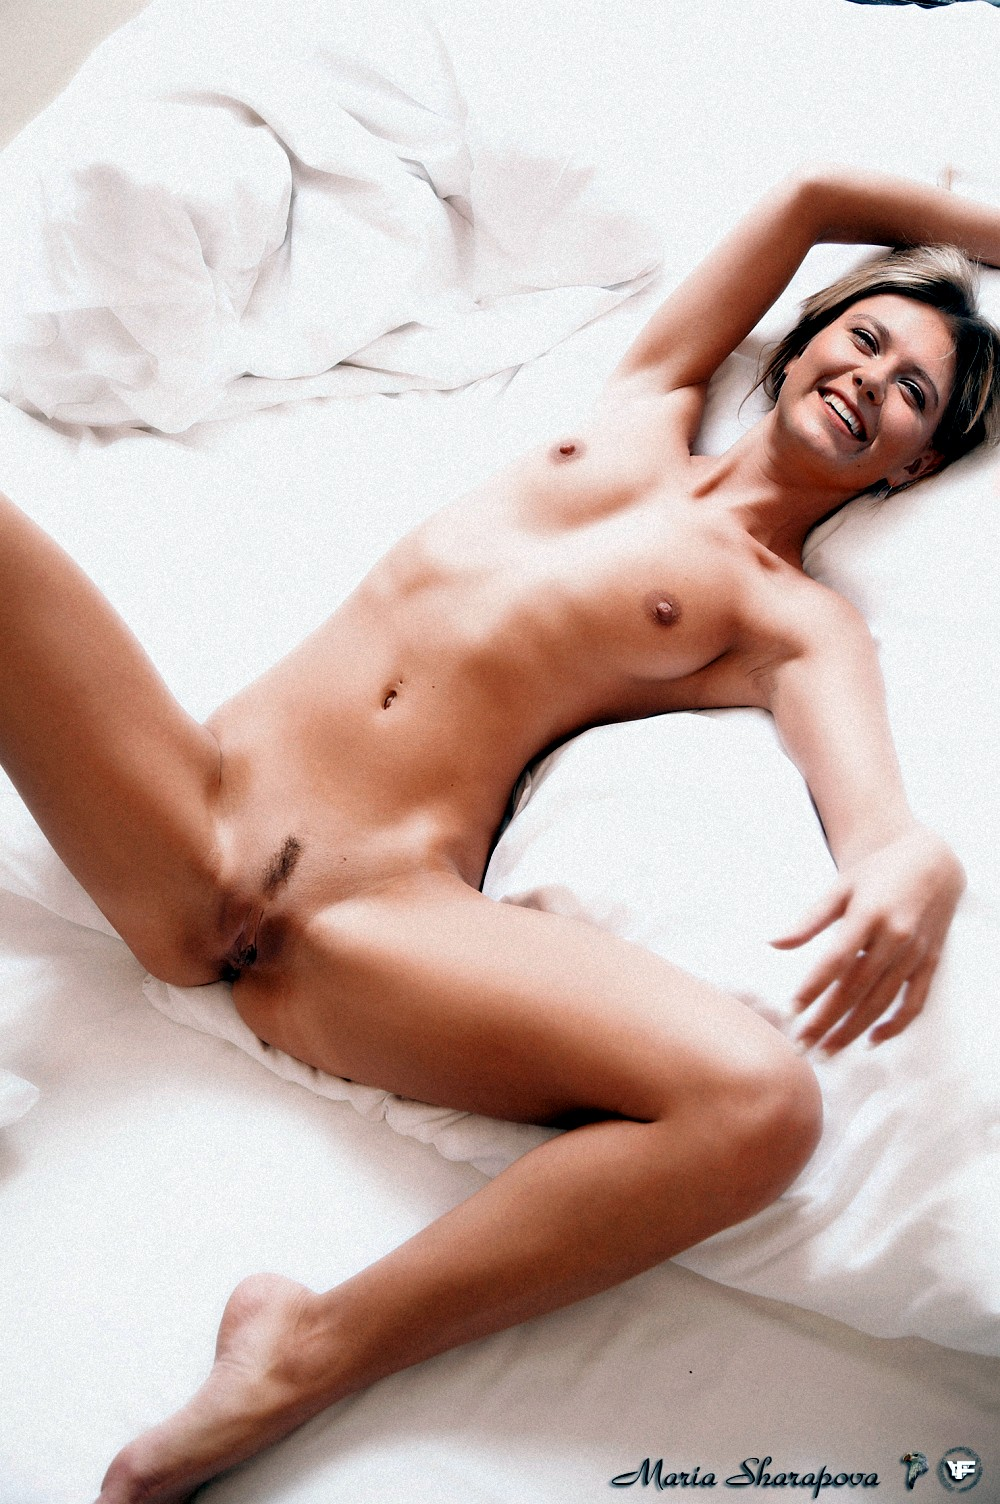 Секс фотки мария шарапова 23 фотография